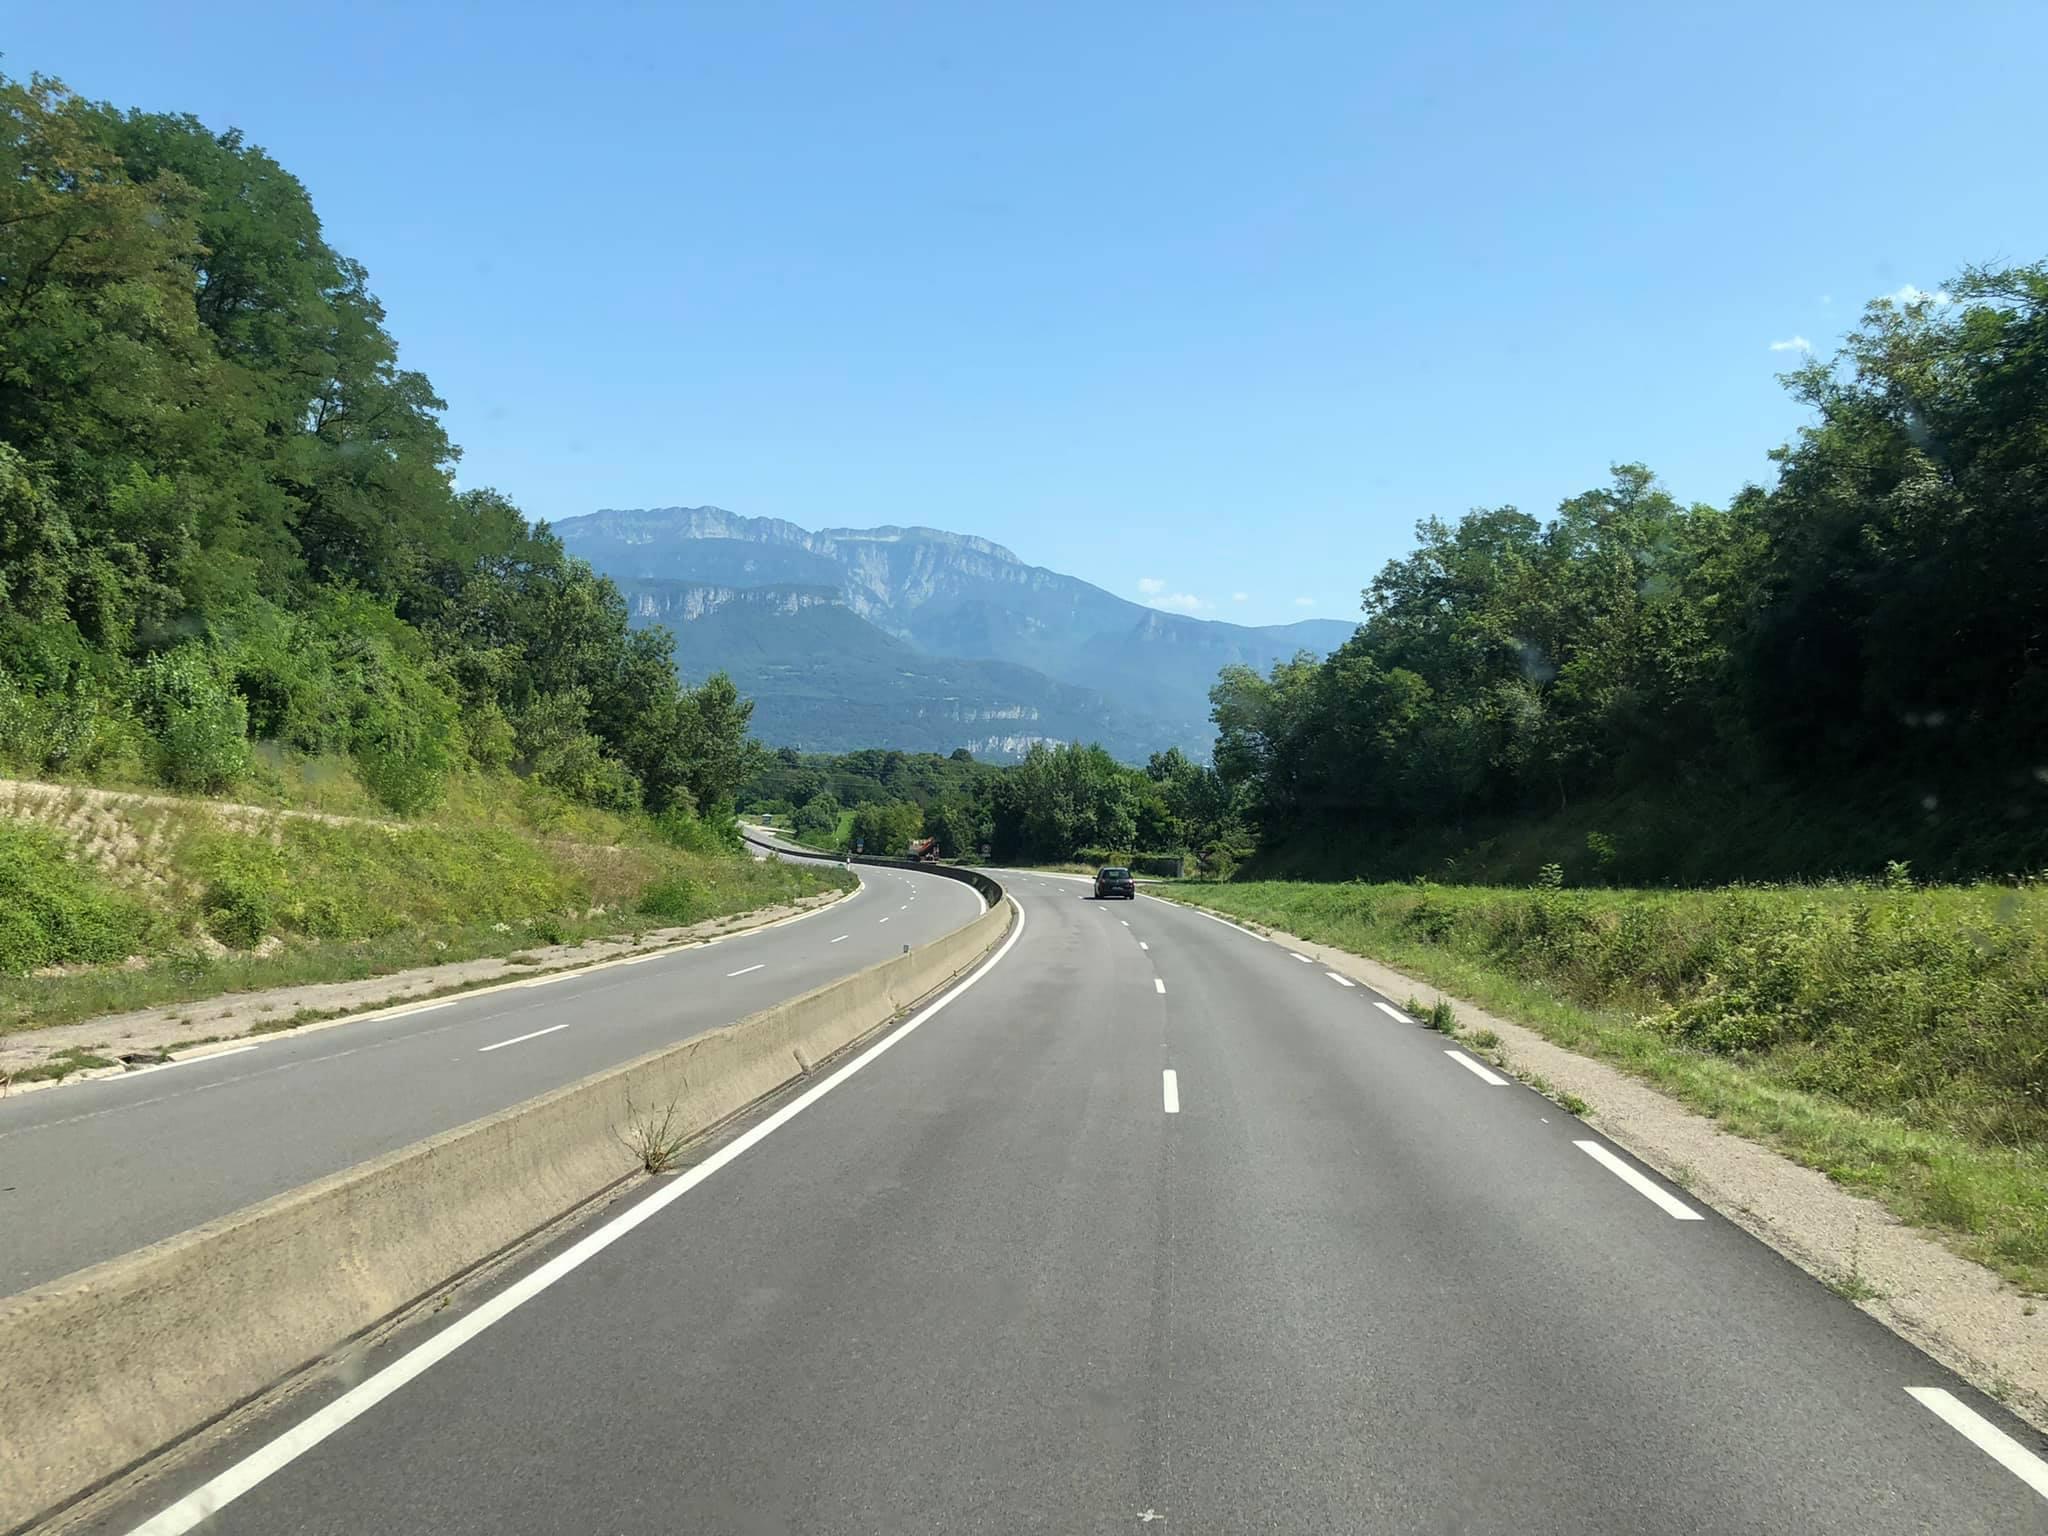 Lyon-Grenoble-lossen-Mantmelian-laden--(2)